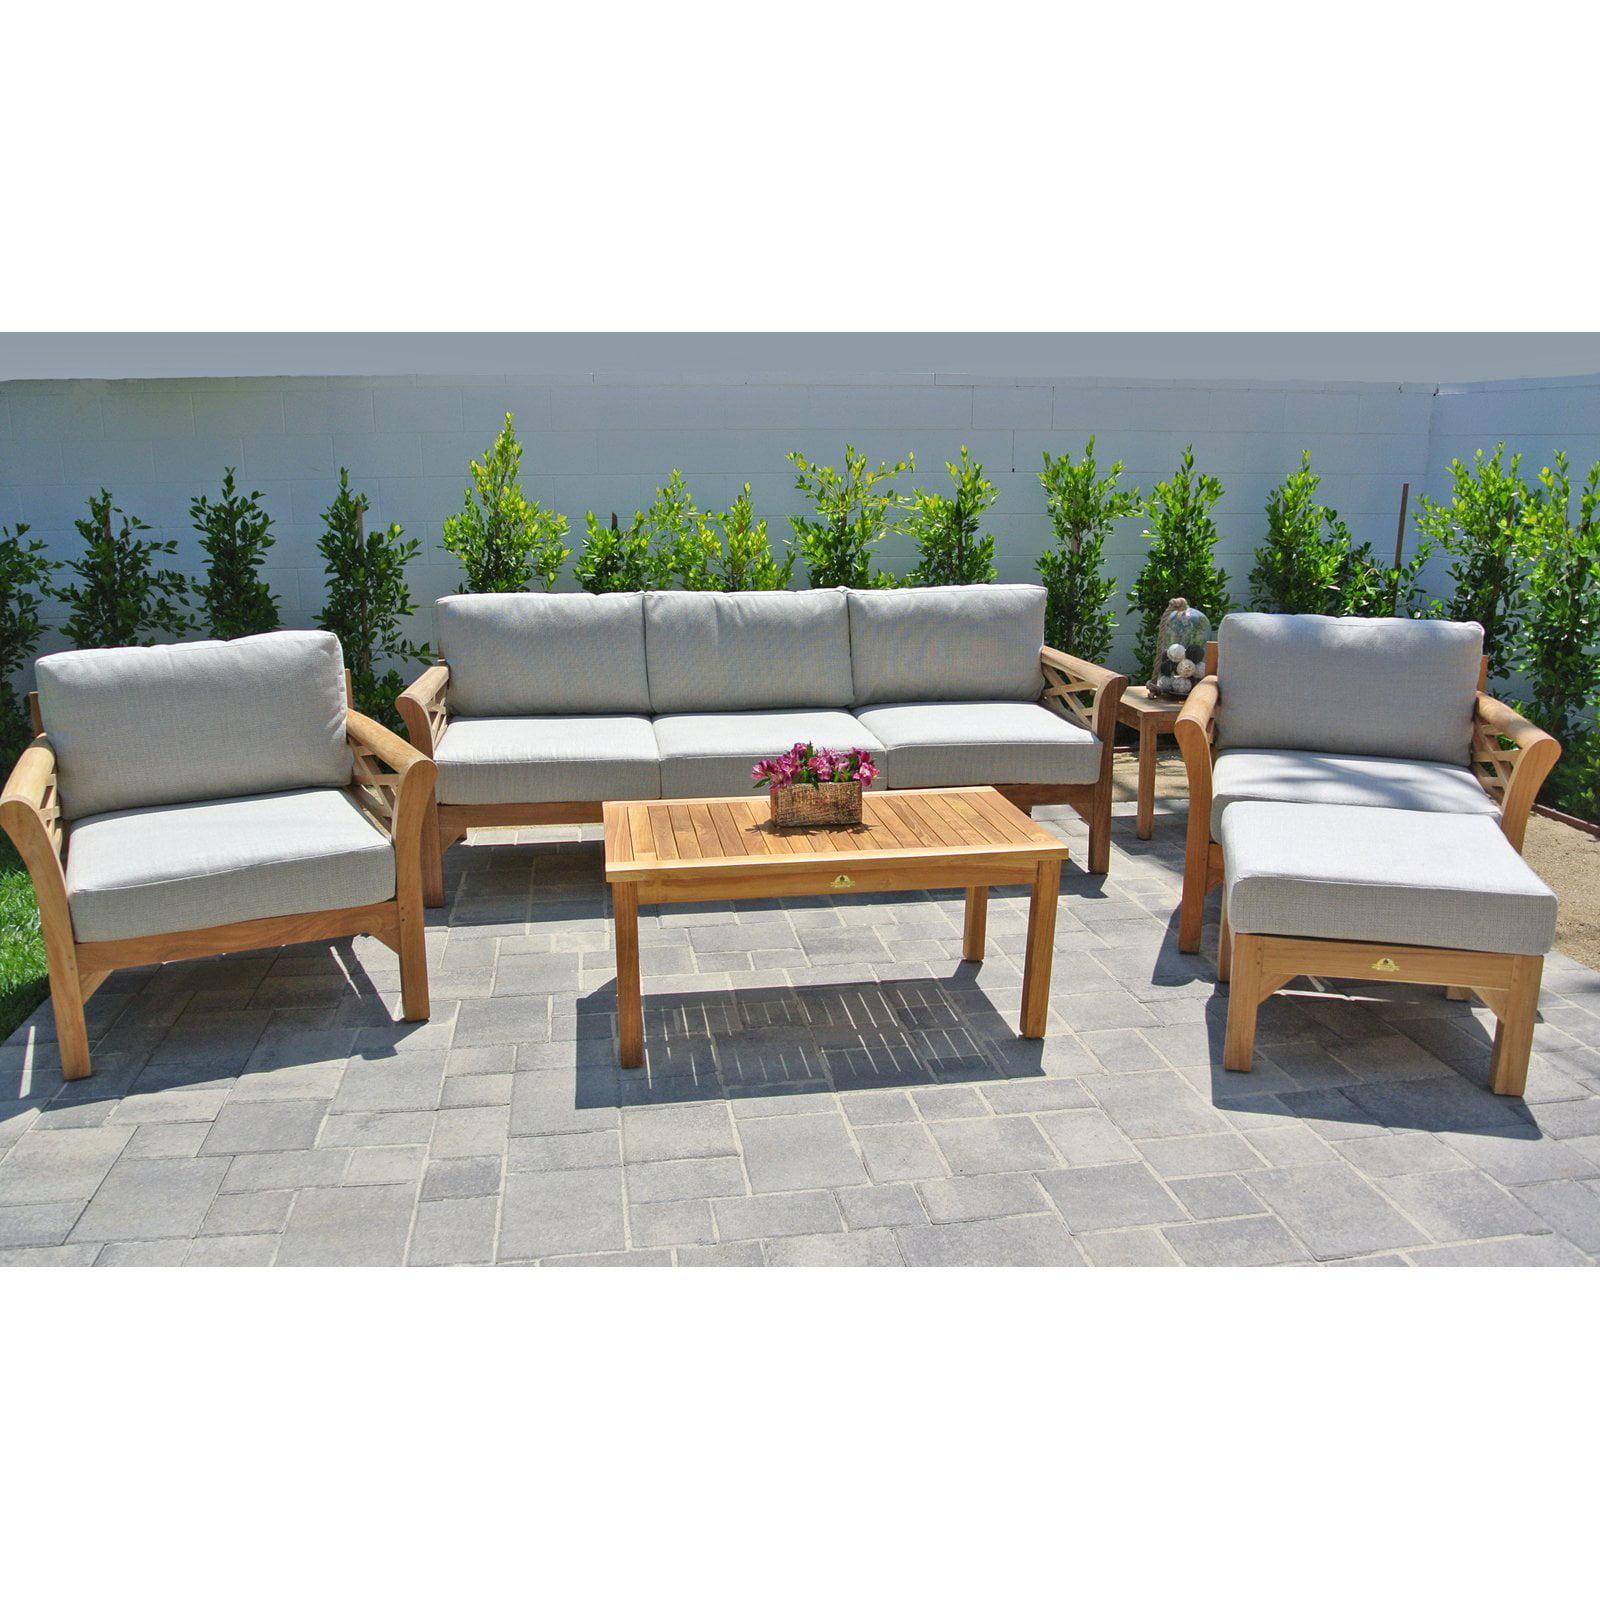 Willow Creek Designs Monterey Teak 6 Piece Deep Seating Patio Set